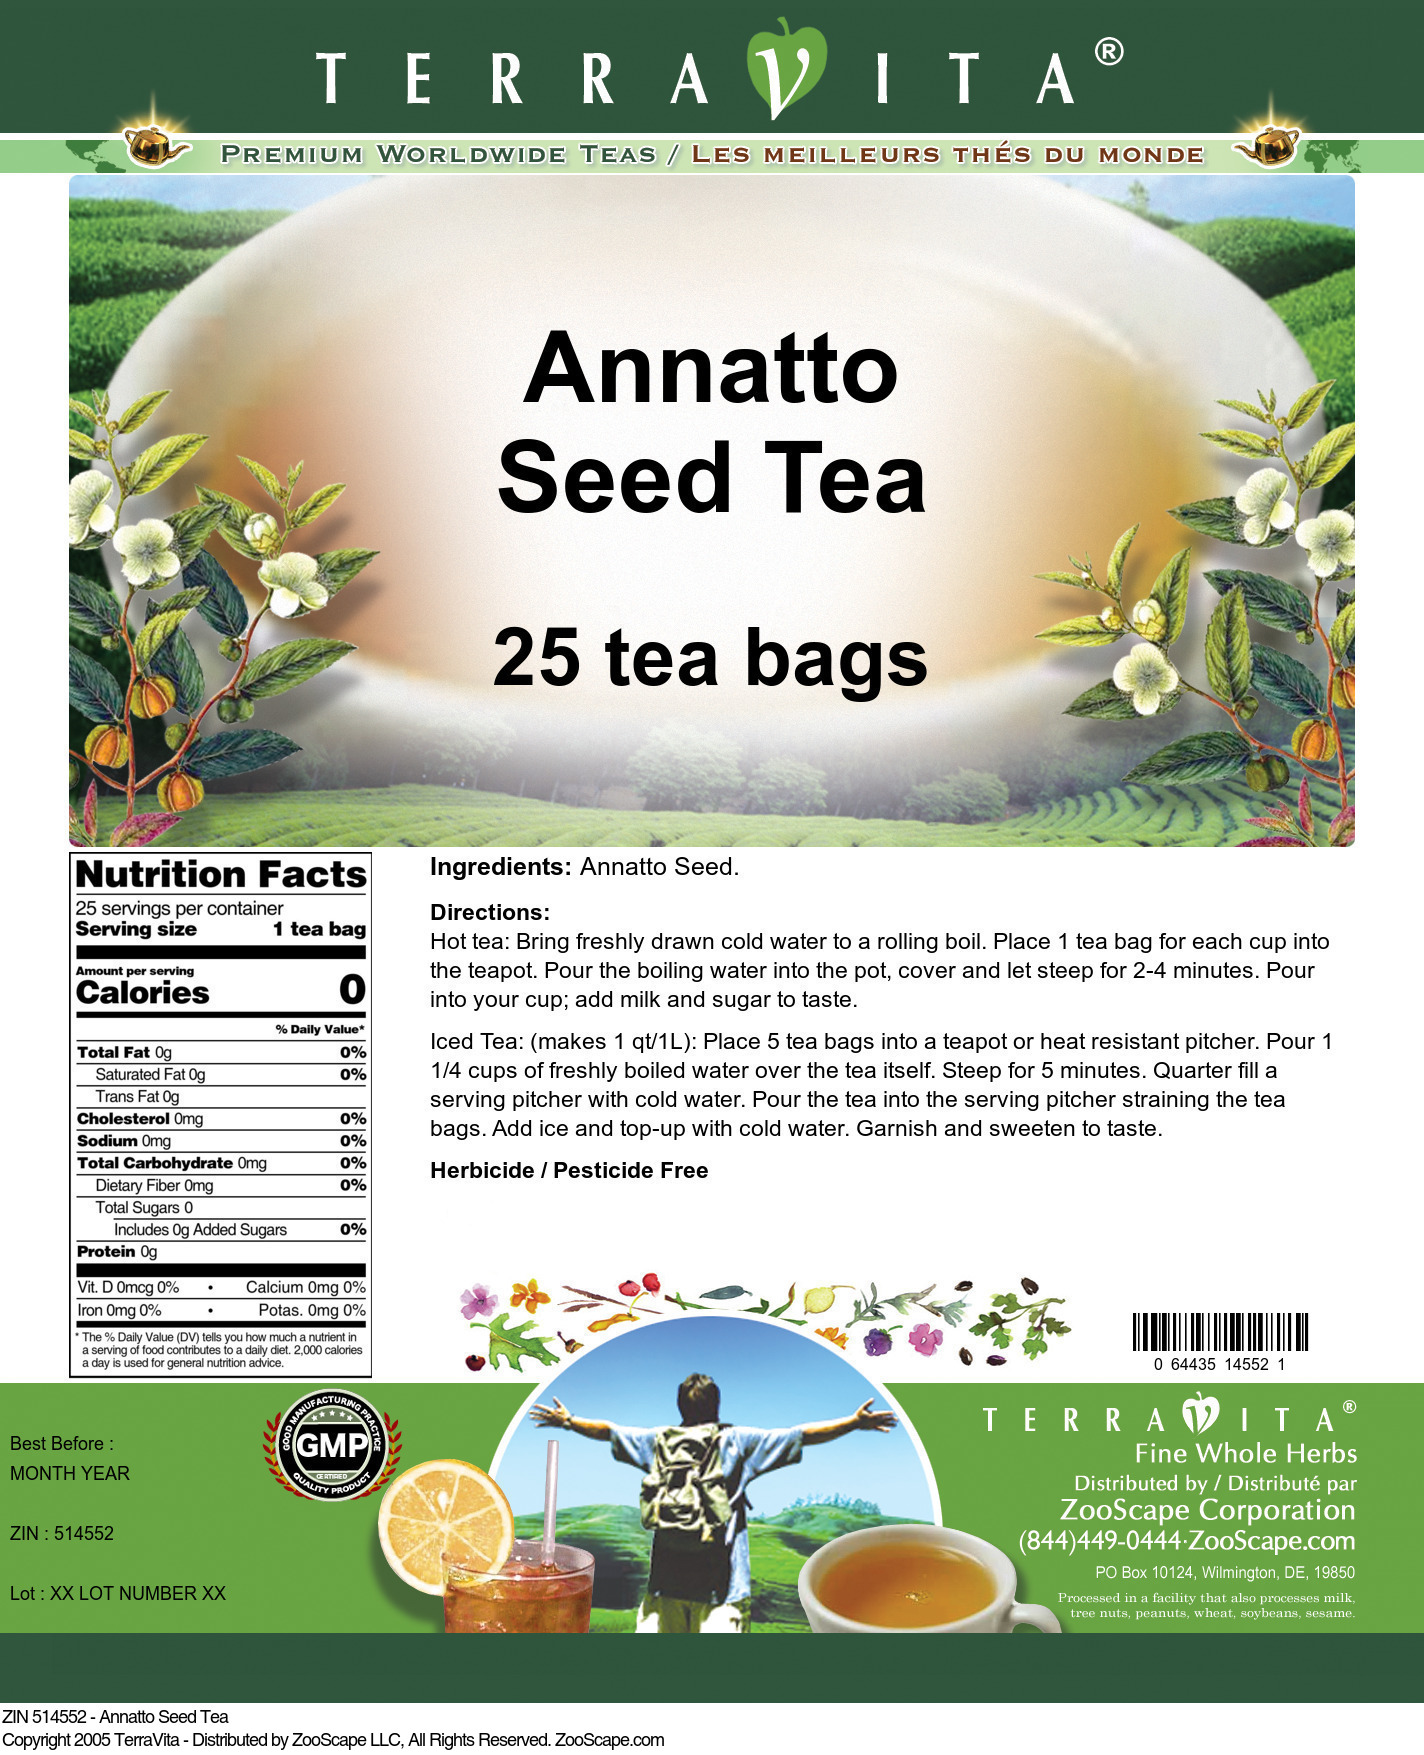 Annatto Seed Tea